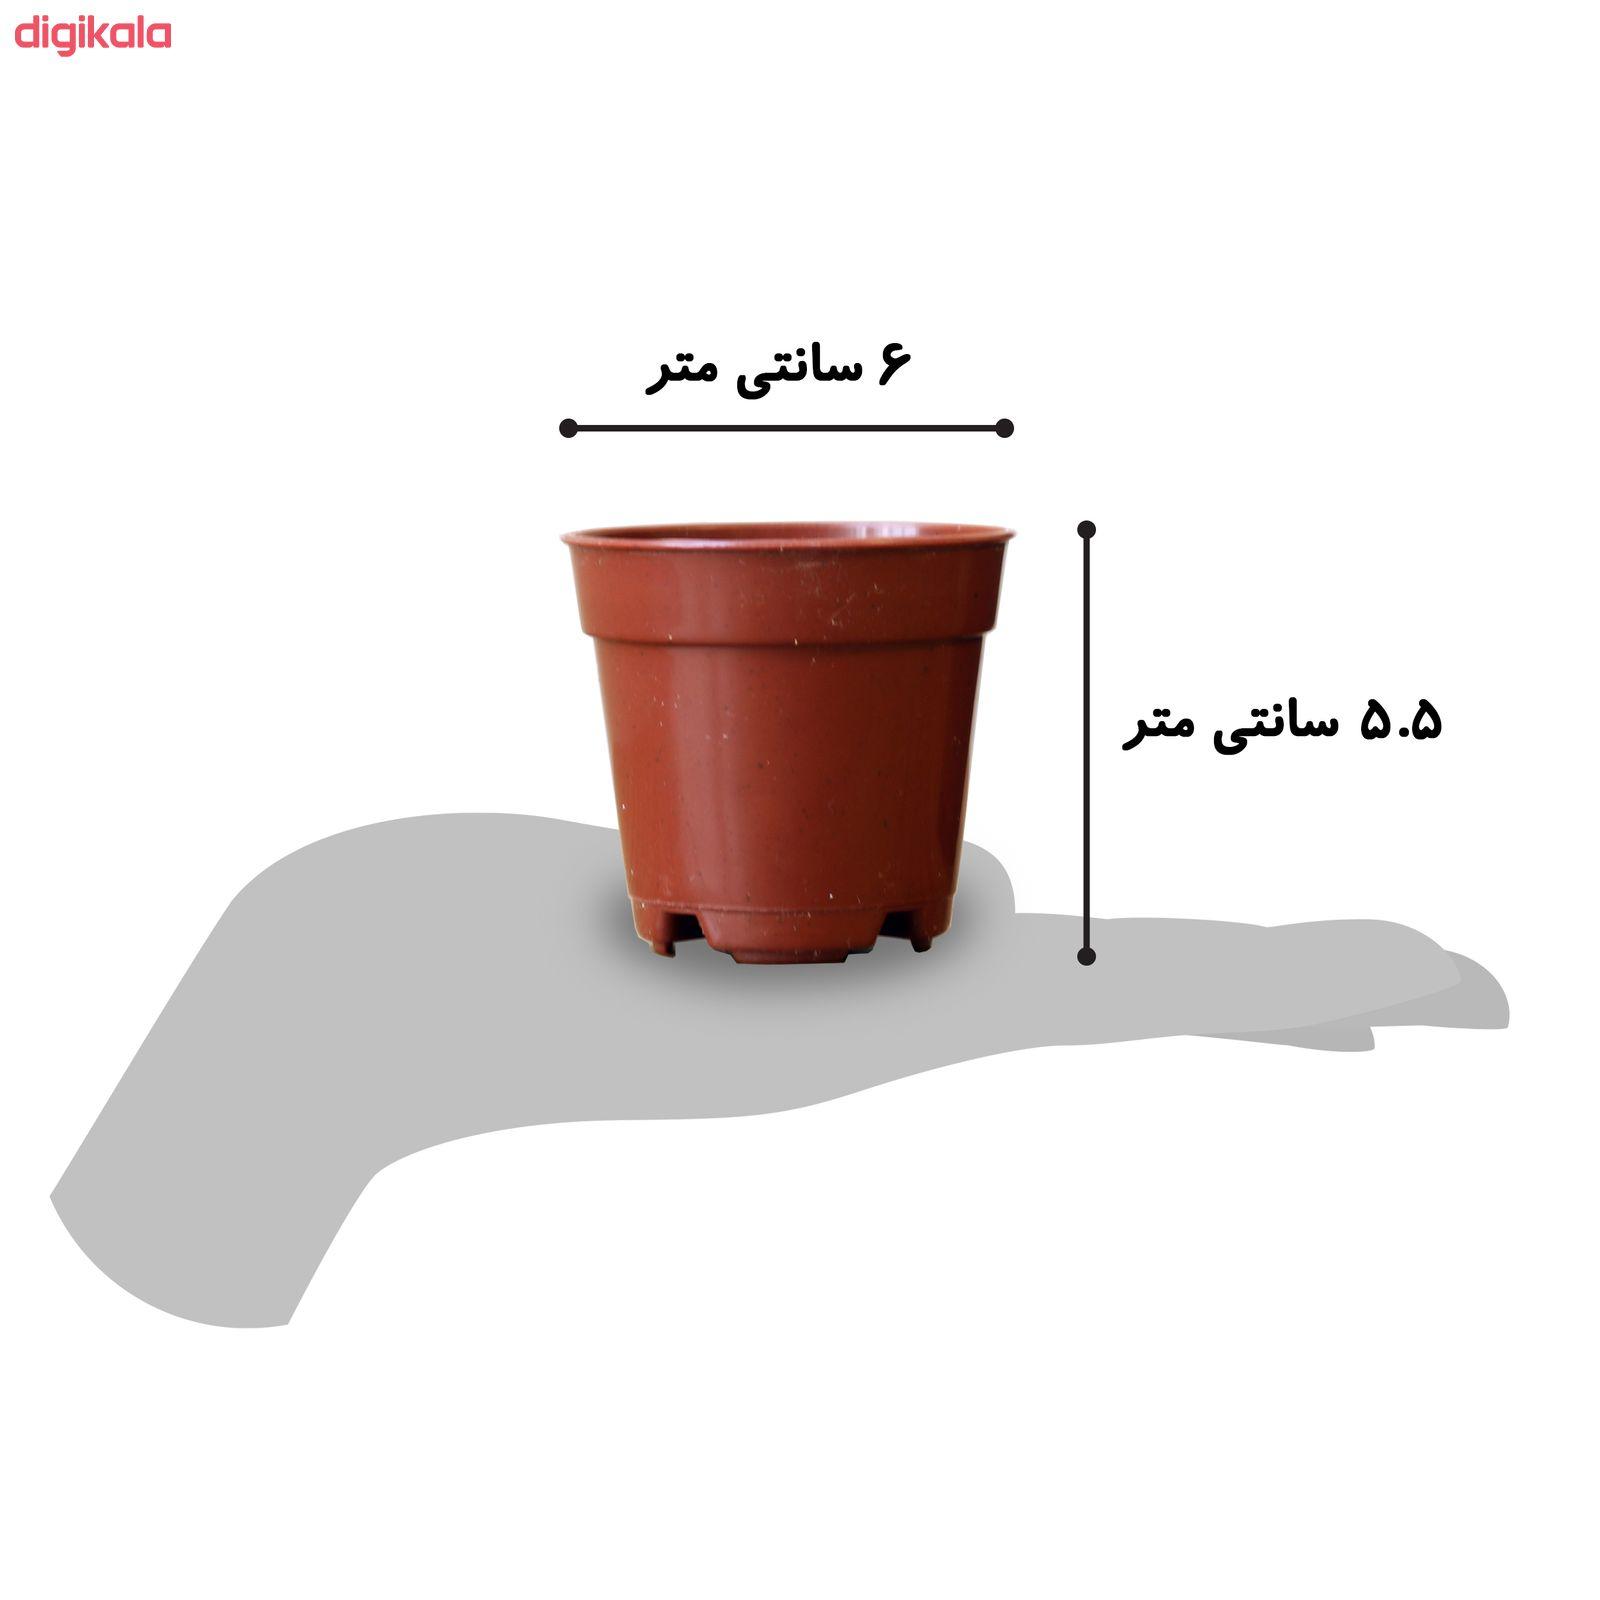 گیاه طبیعی کاکتوس و ساکولنت آیدین کاکتوس کد CB-009 بسته 12 عددی main 1 8